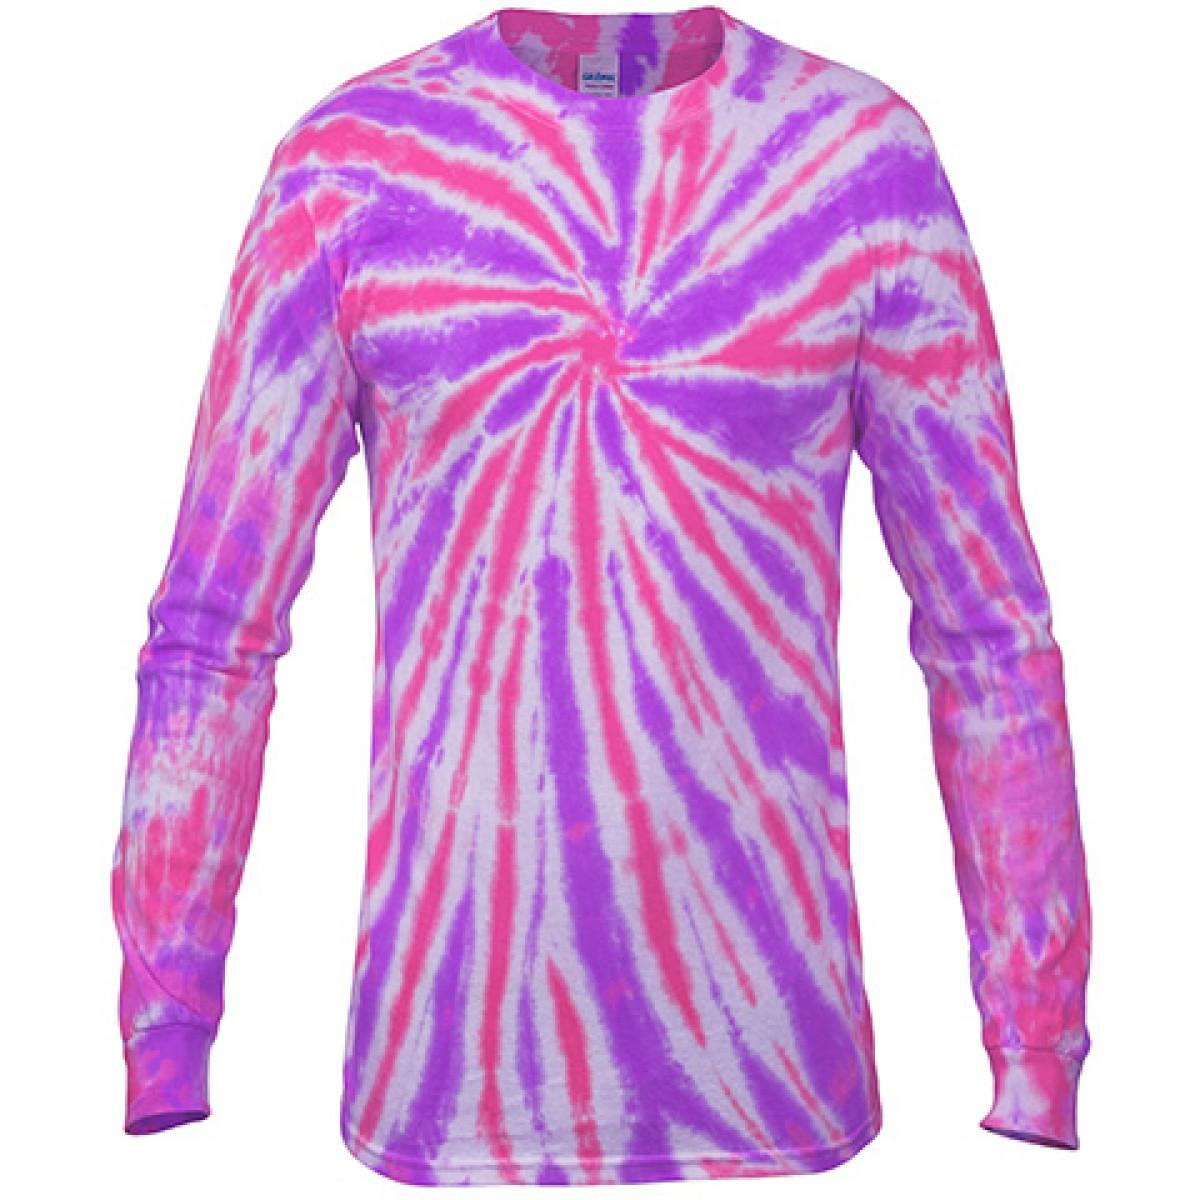 Multi Color Tie-Dye Long Sleeve Shirt -Purple-YL